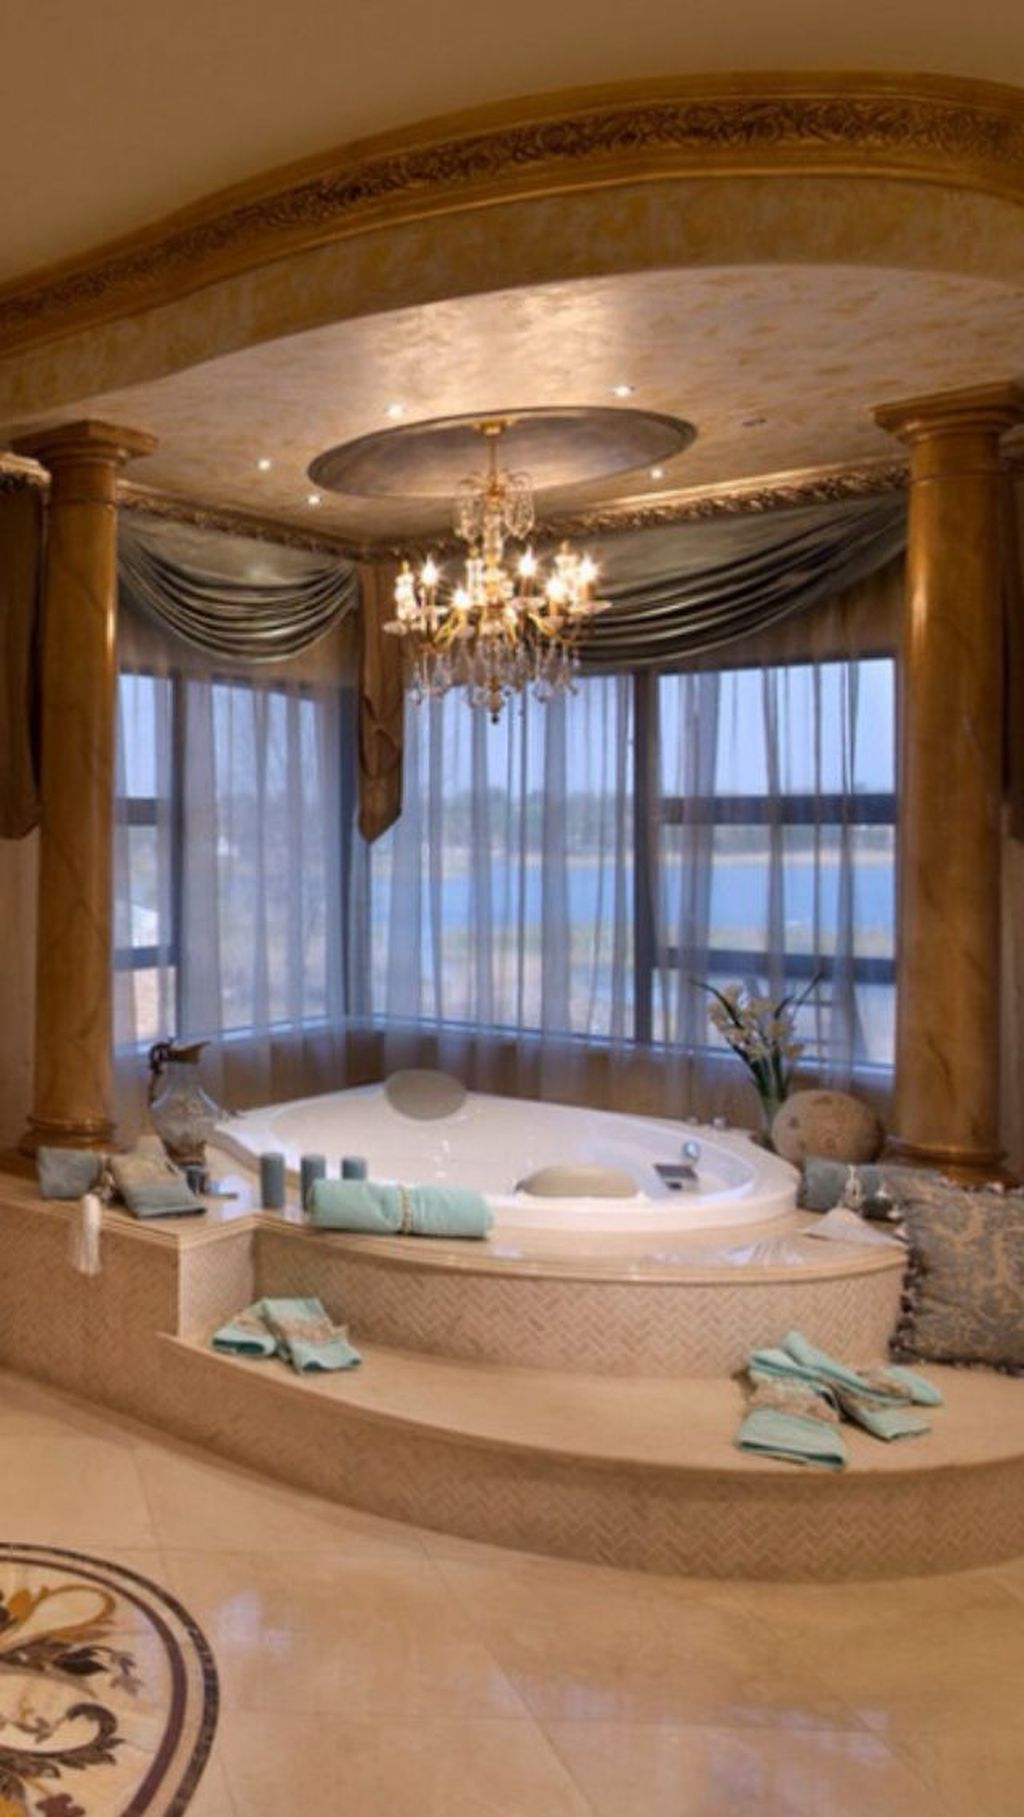 99 Romantic and Elegant Bathroom Design Ideas with Chandeliers #dreambathrooms